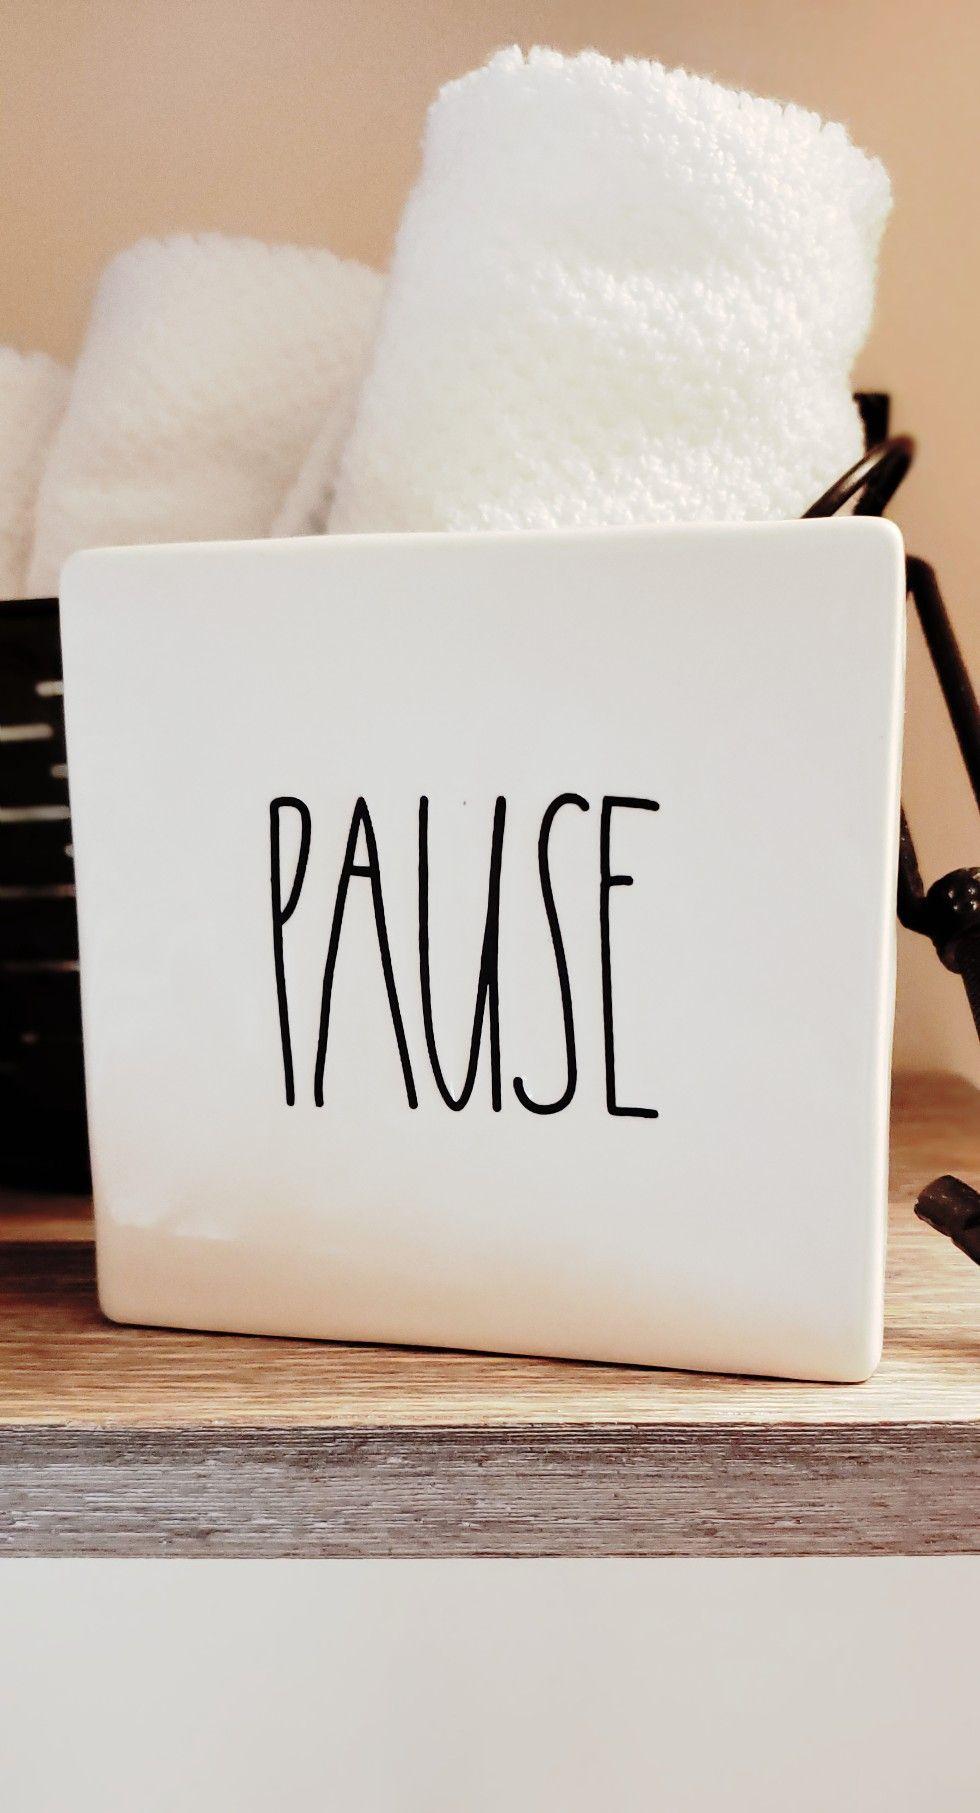 pause breathe repair your universe proceed #raedunn | ♡ Rae Dunn ...